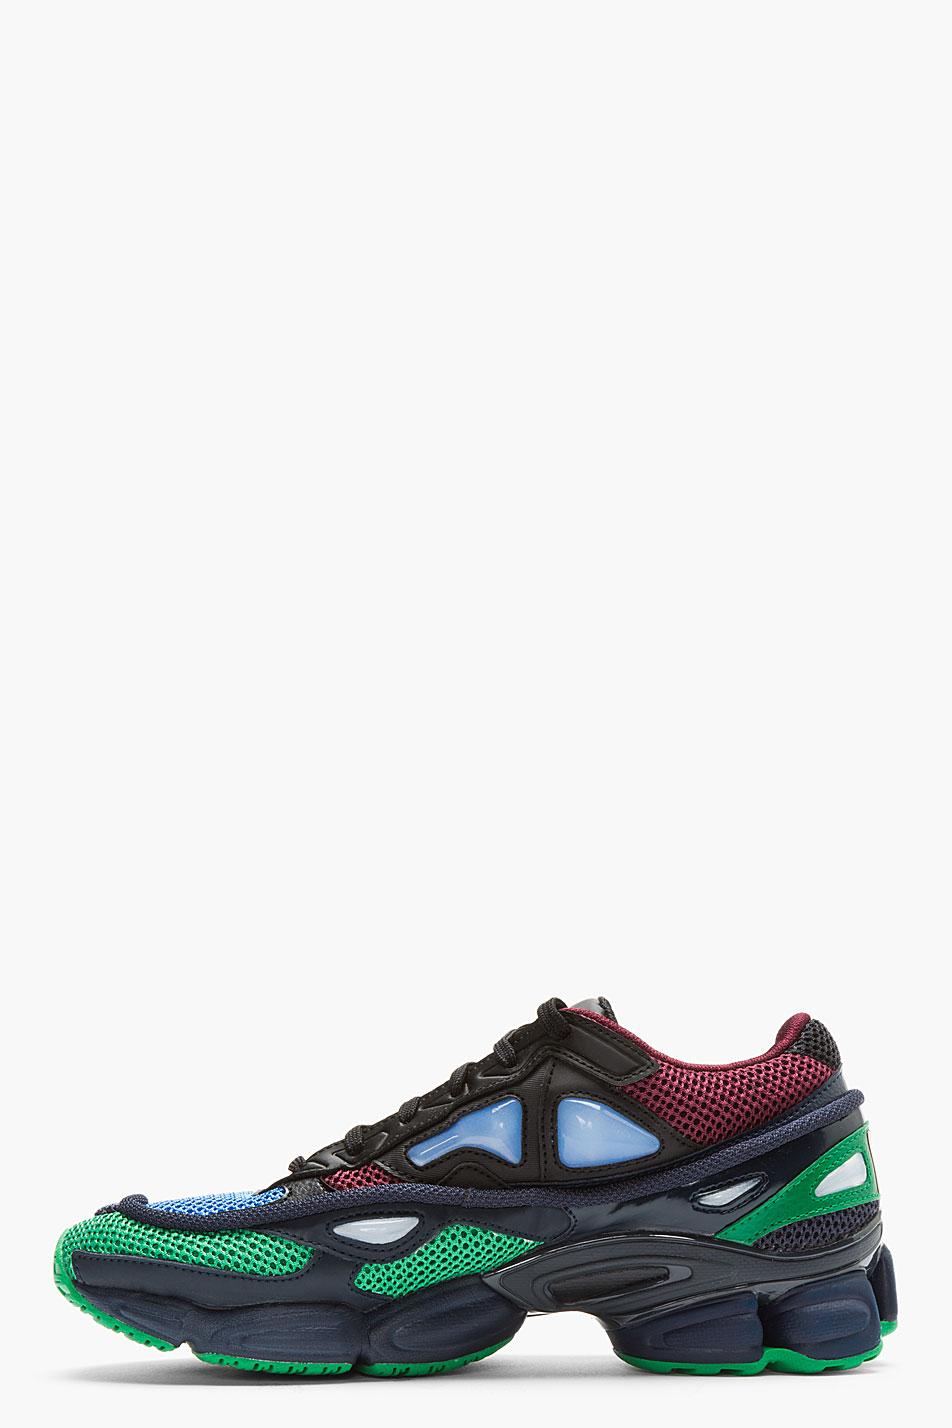 online store 8cf62 ac73f raf-simons-blue-blue-mesh-adidas -edition-response-sneakers-product-3-13167419-586773911.jpeg